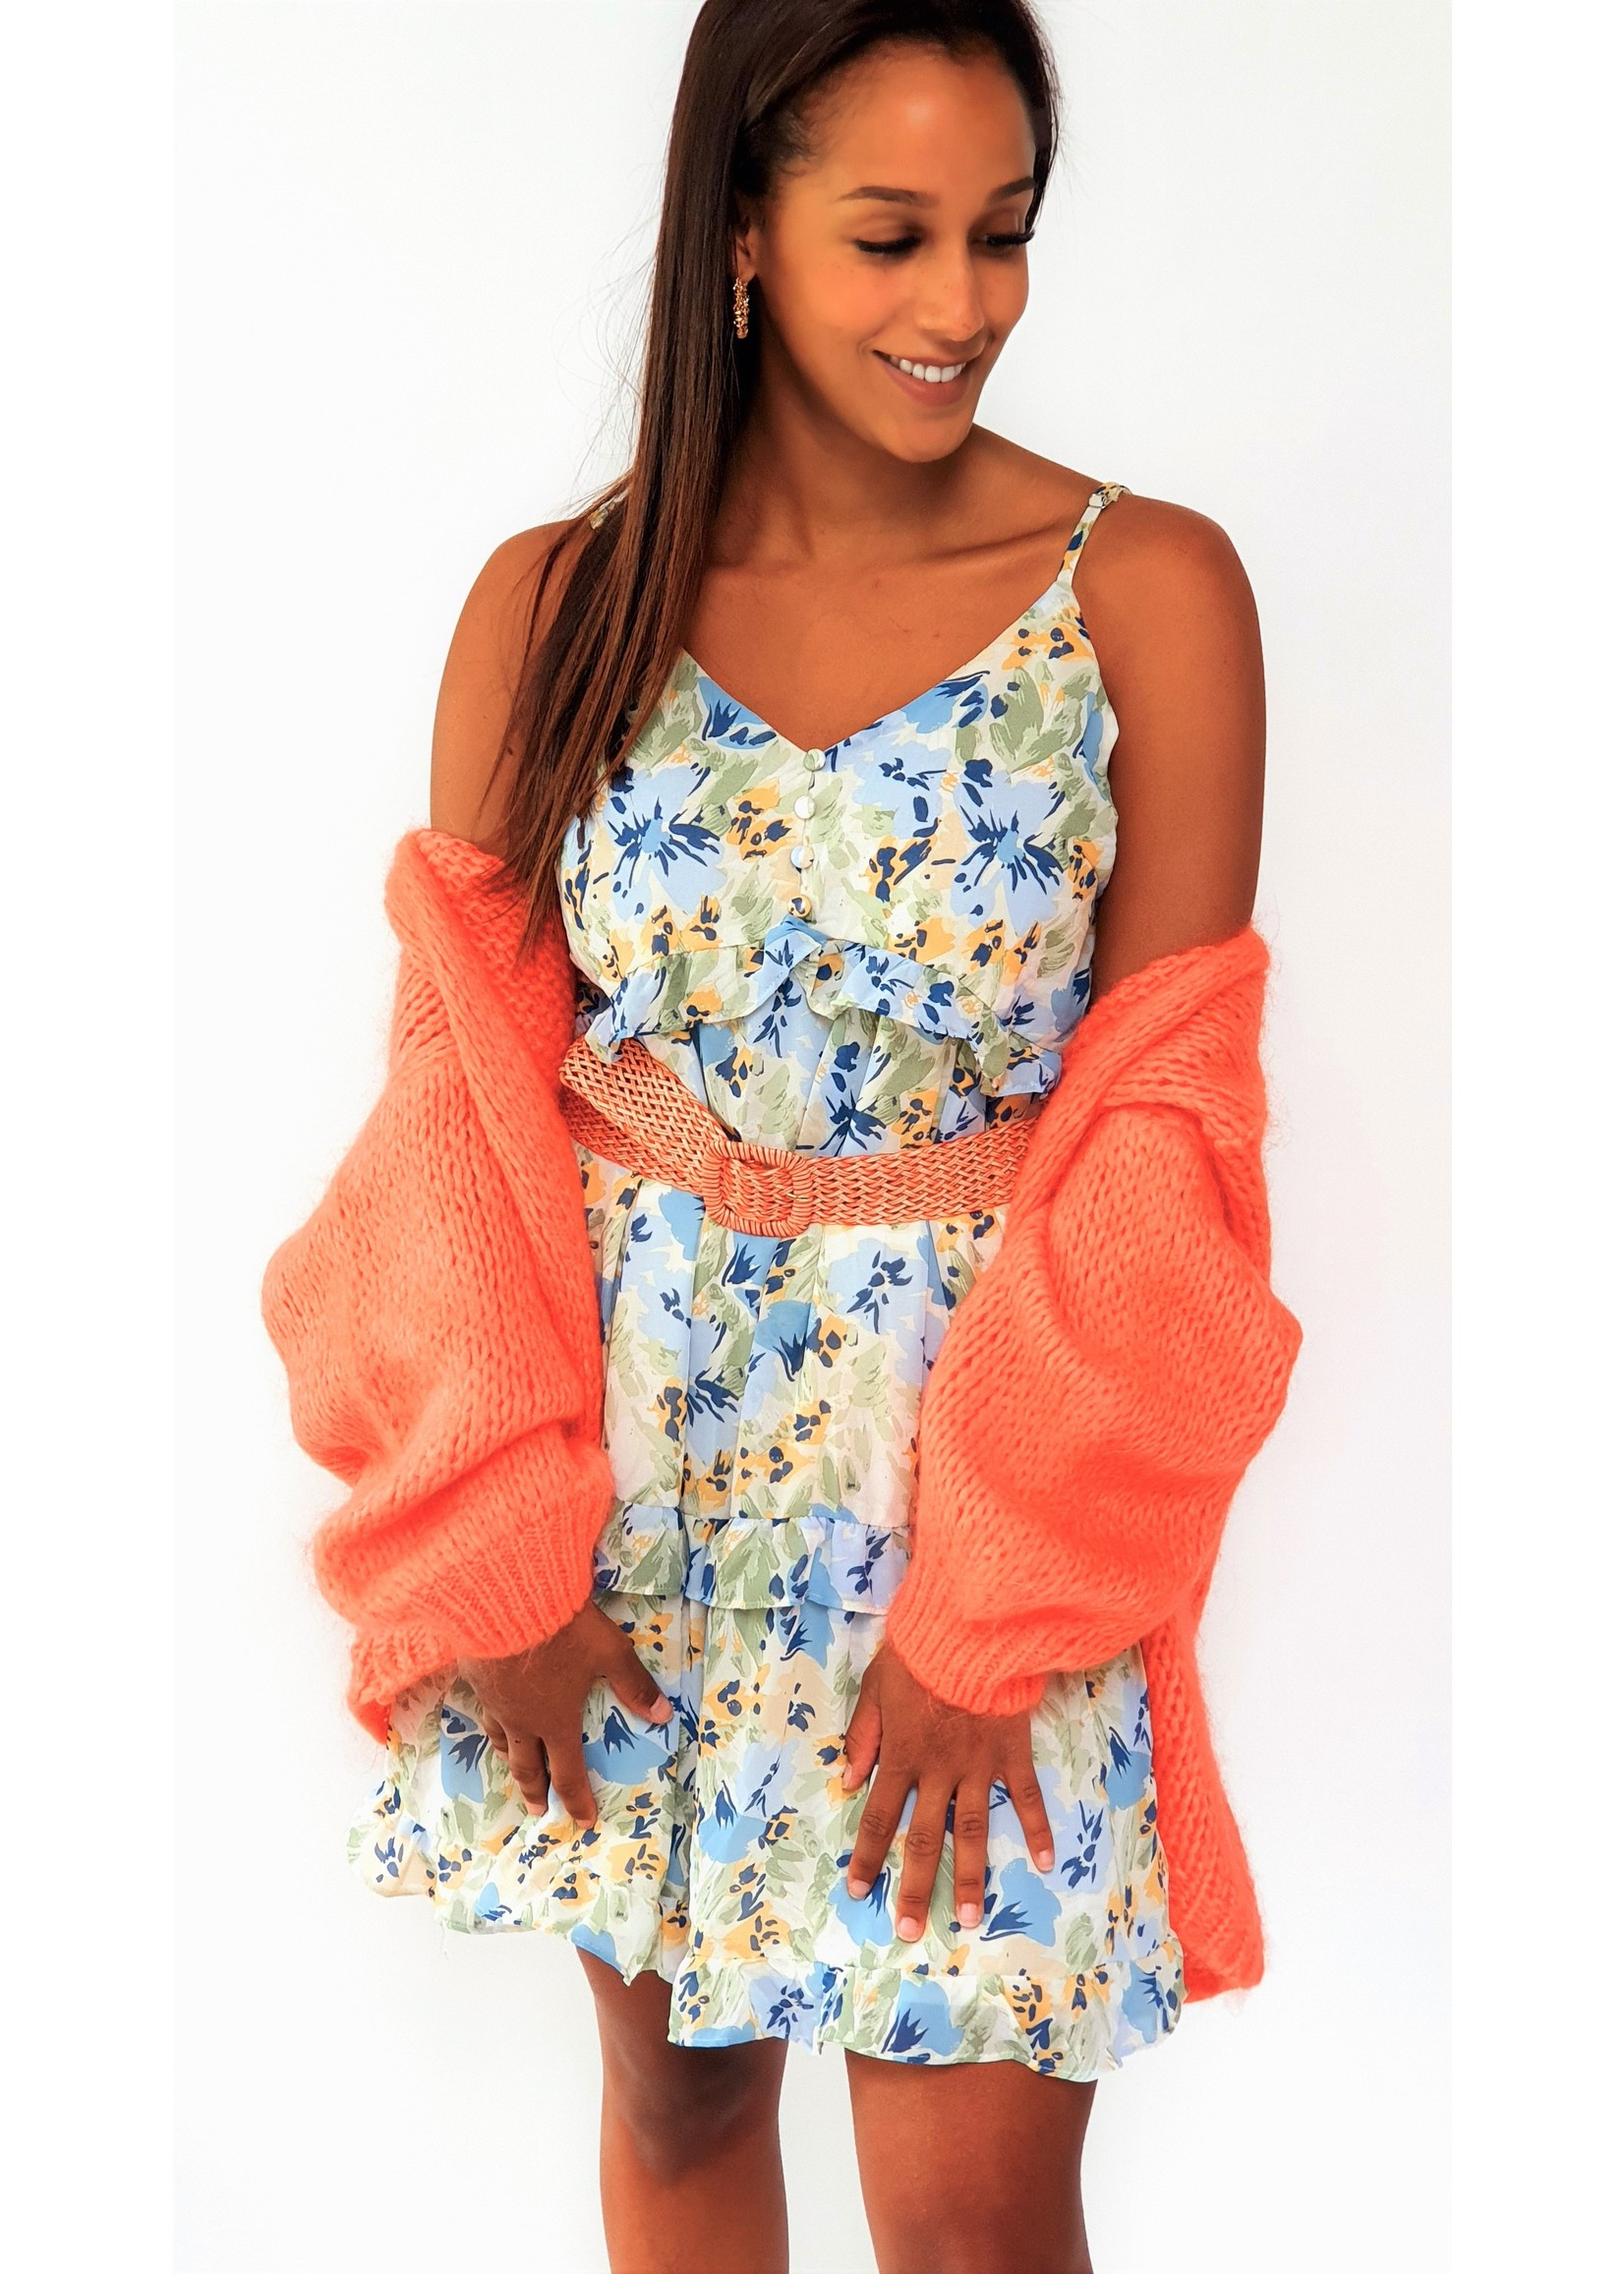 Poppy coral orange cardigan